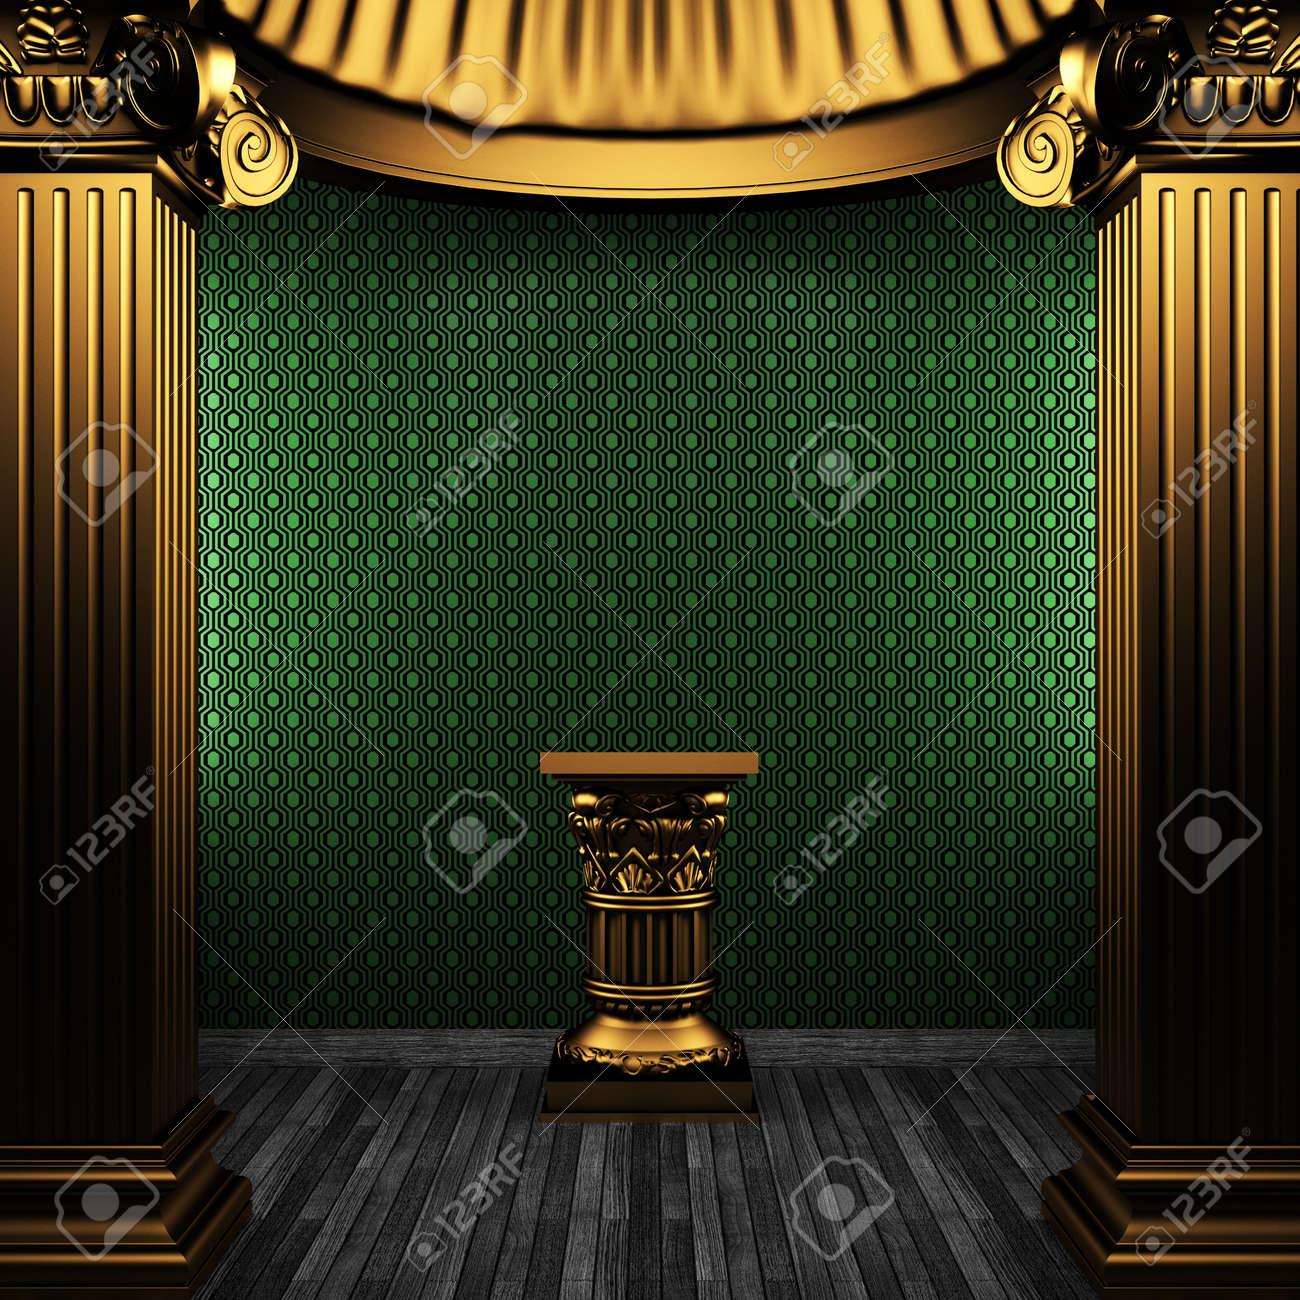 bronze columns, pedestal and wallpaper made in 3D Stock Photo - 8471229